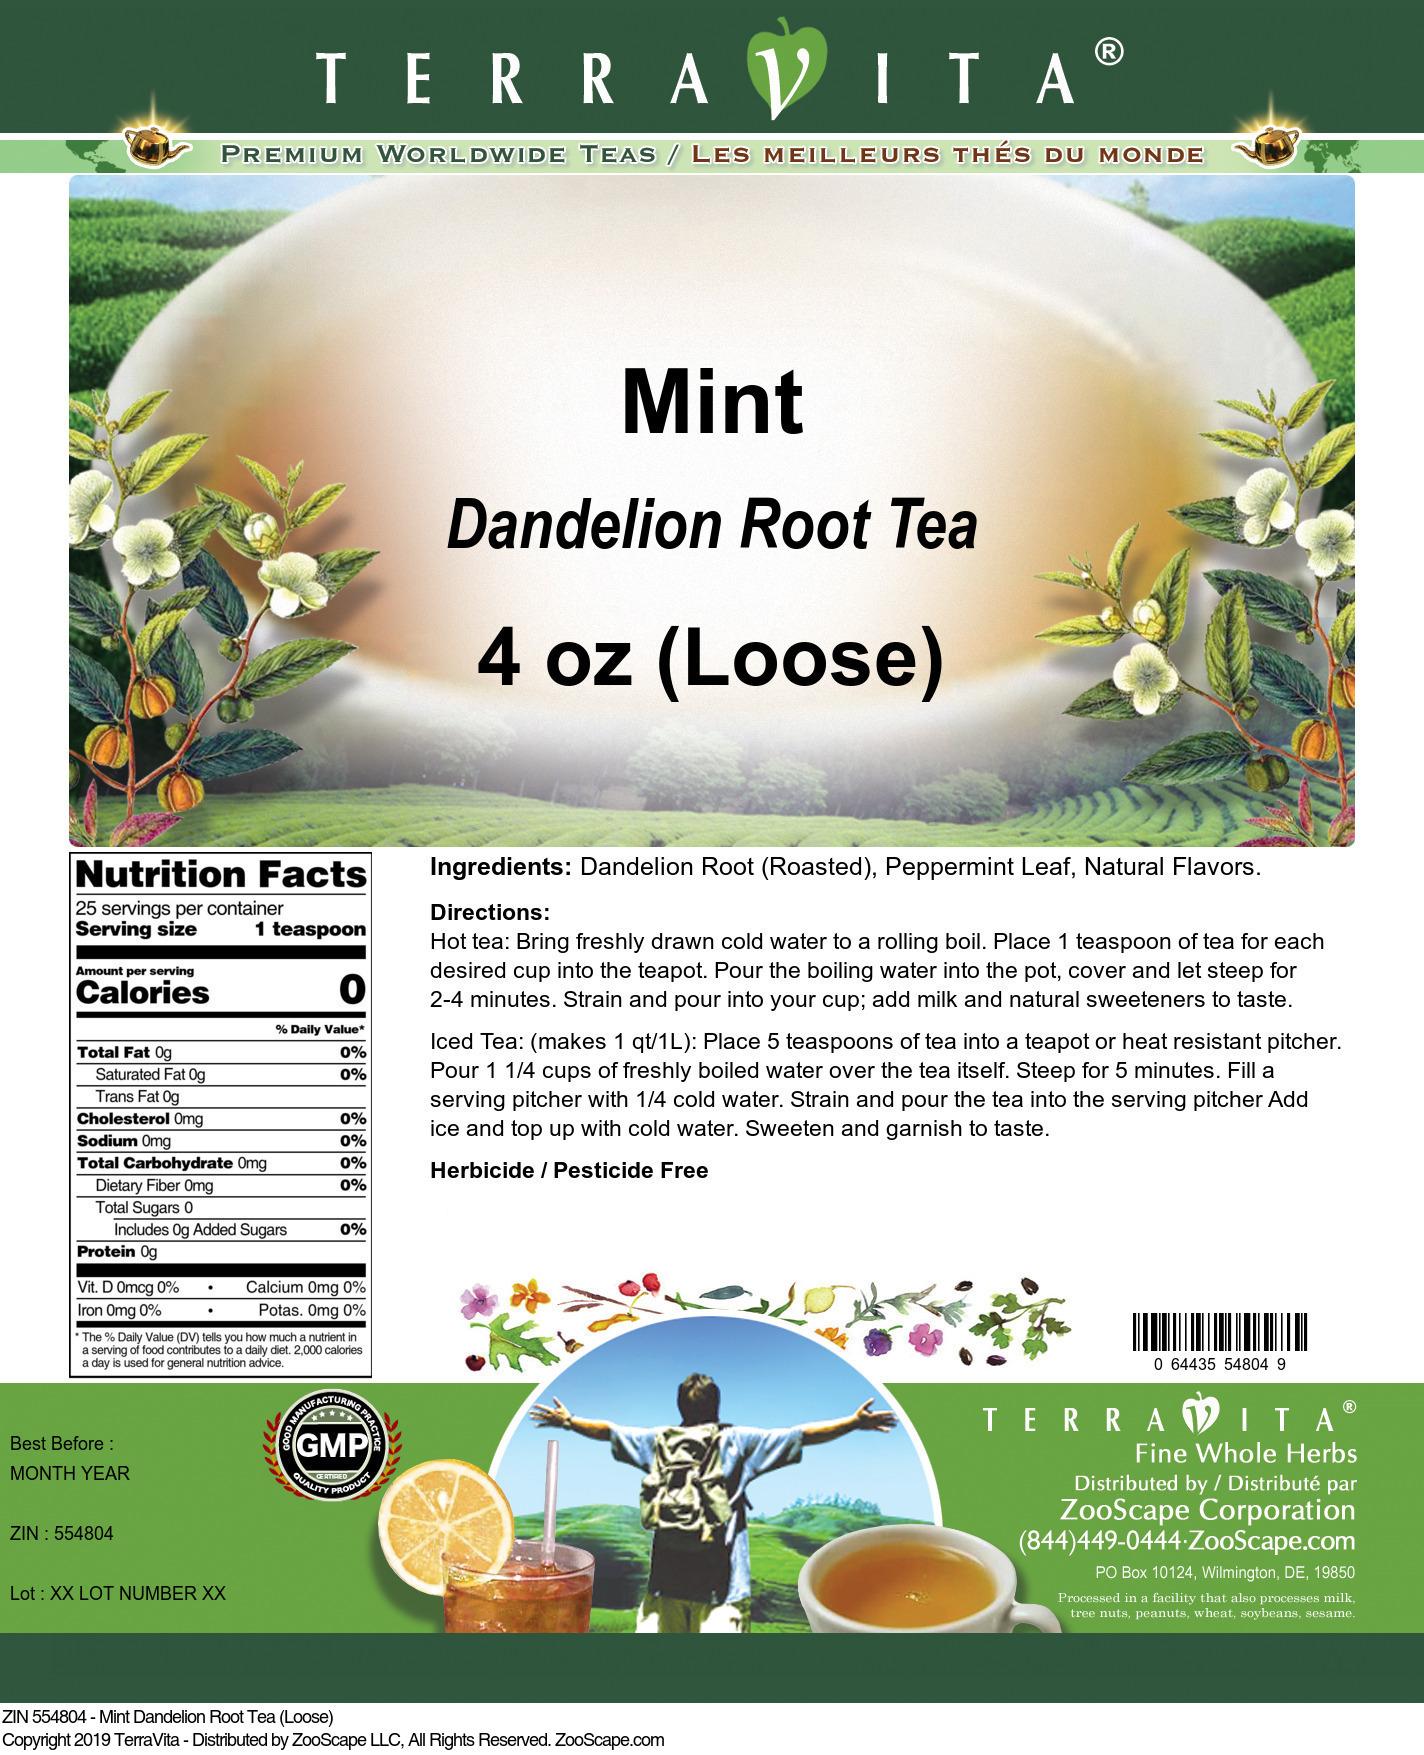 Mint Dandelion Root Tea (Loose)